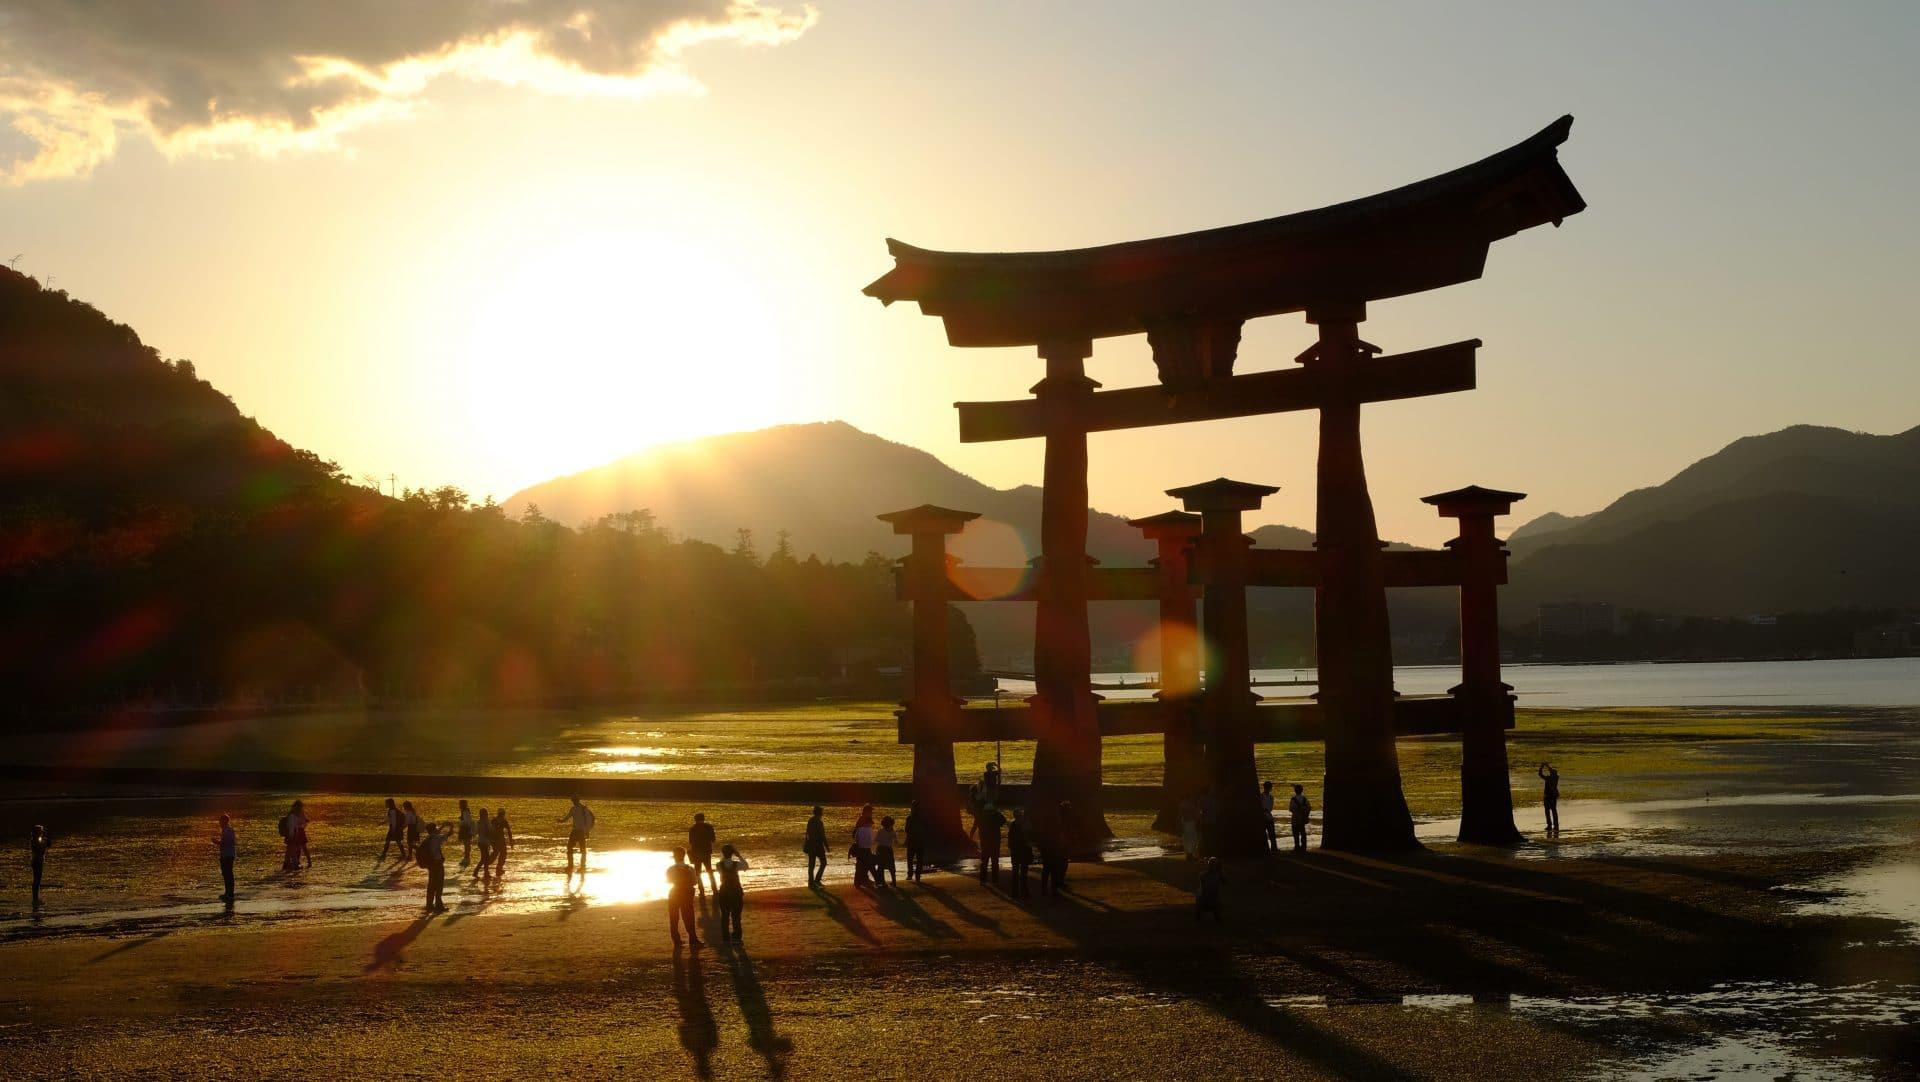 Japon : D'Osaka la Rebelle à Miyajima la Magnifique